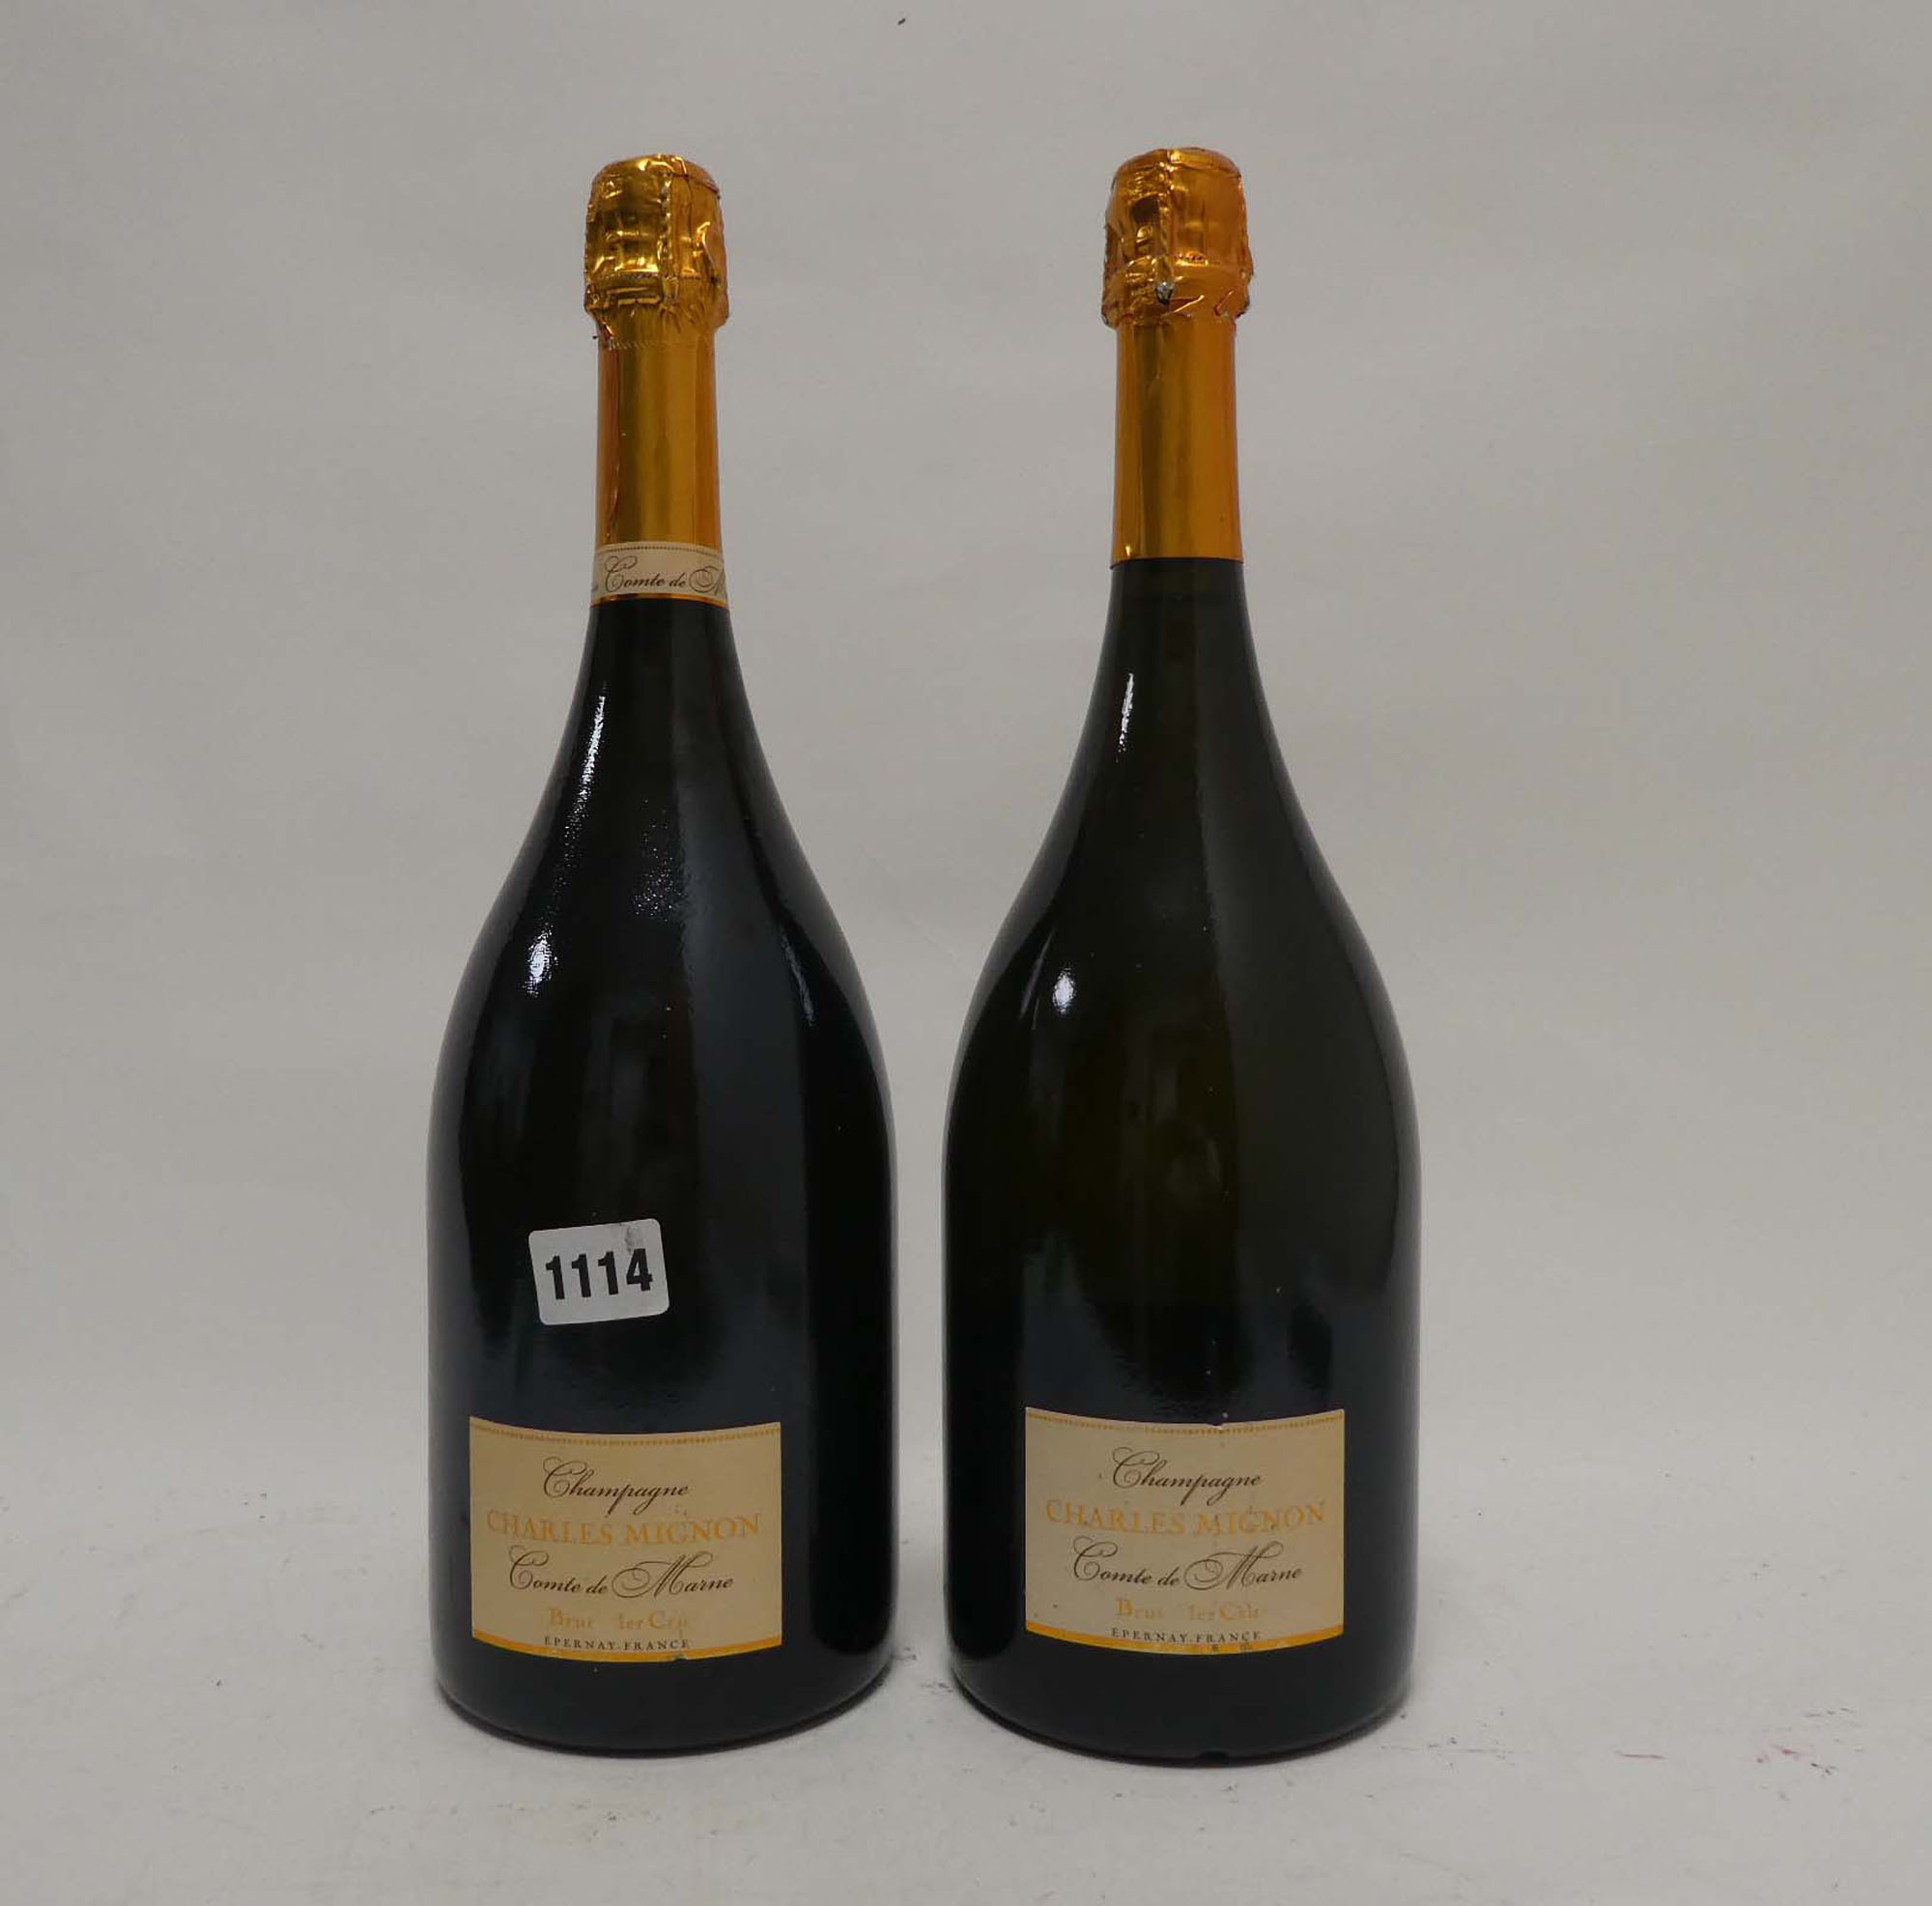 2 Magnums of Charles Mignon Comte De Marne Premier Cru Brut Champagne 150cl 12% each